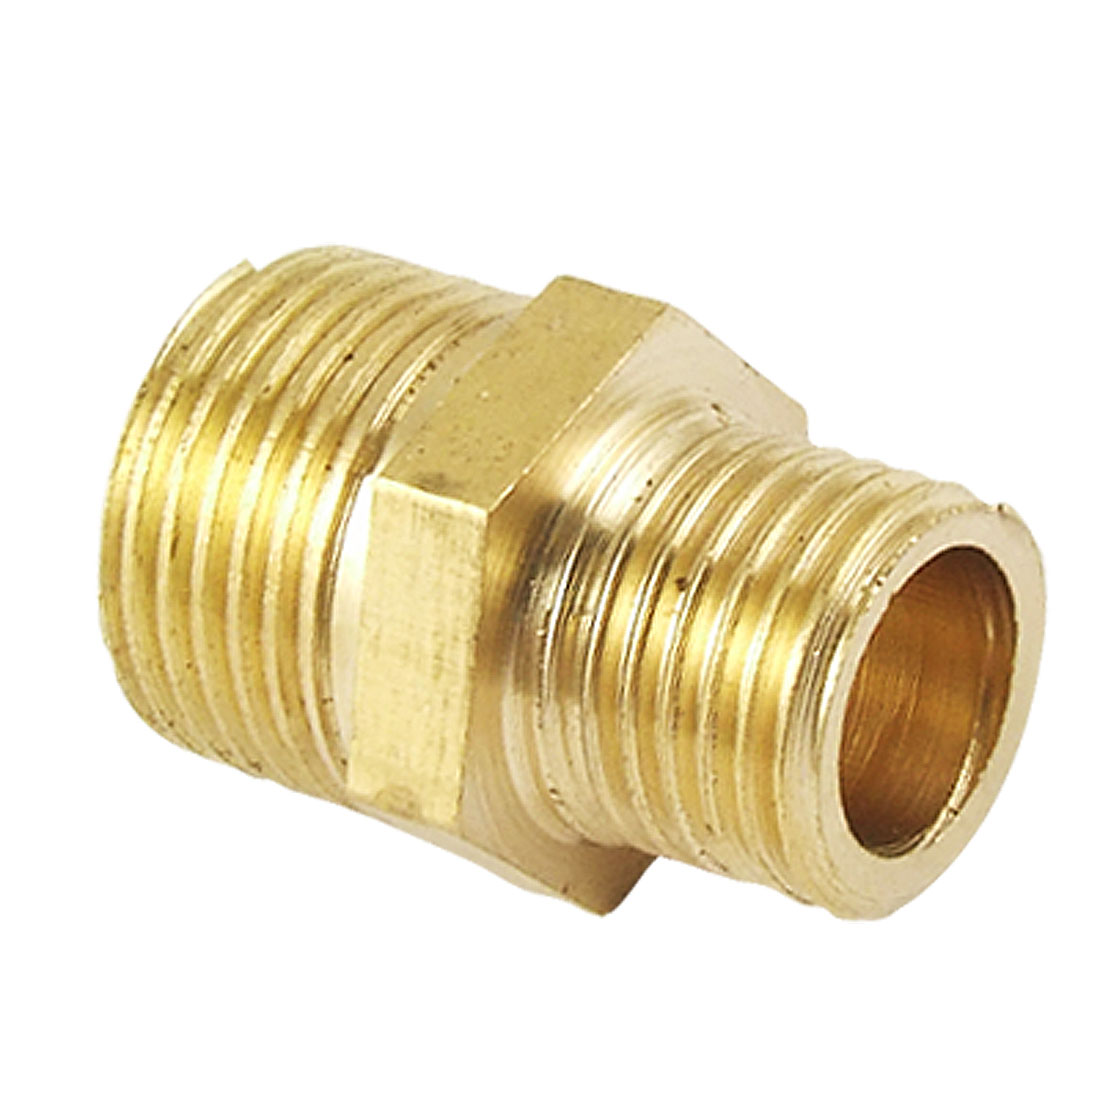 Pneumatic brass pipe fittings adapters lenz